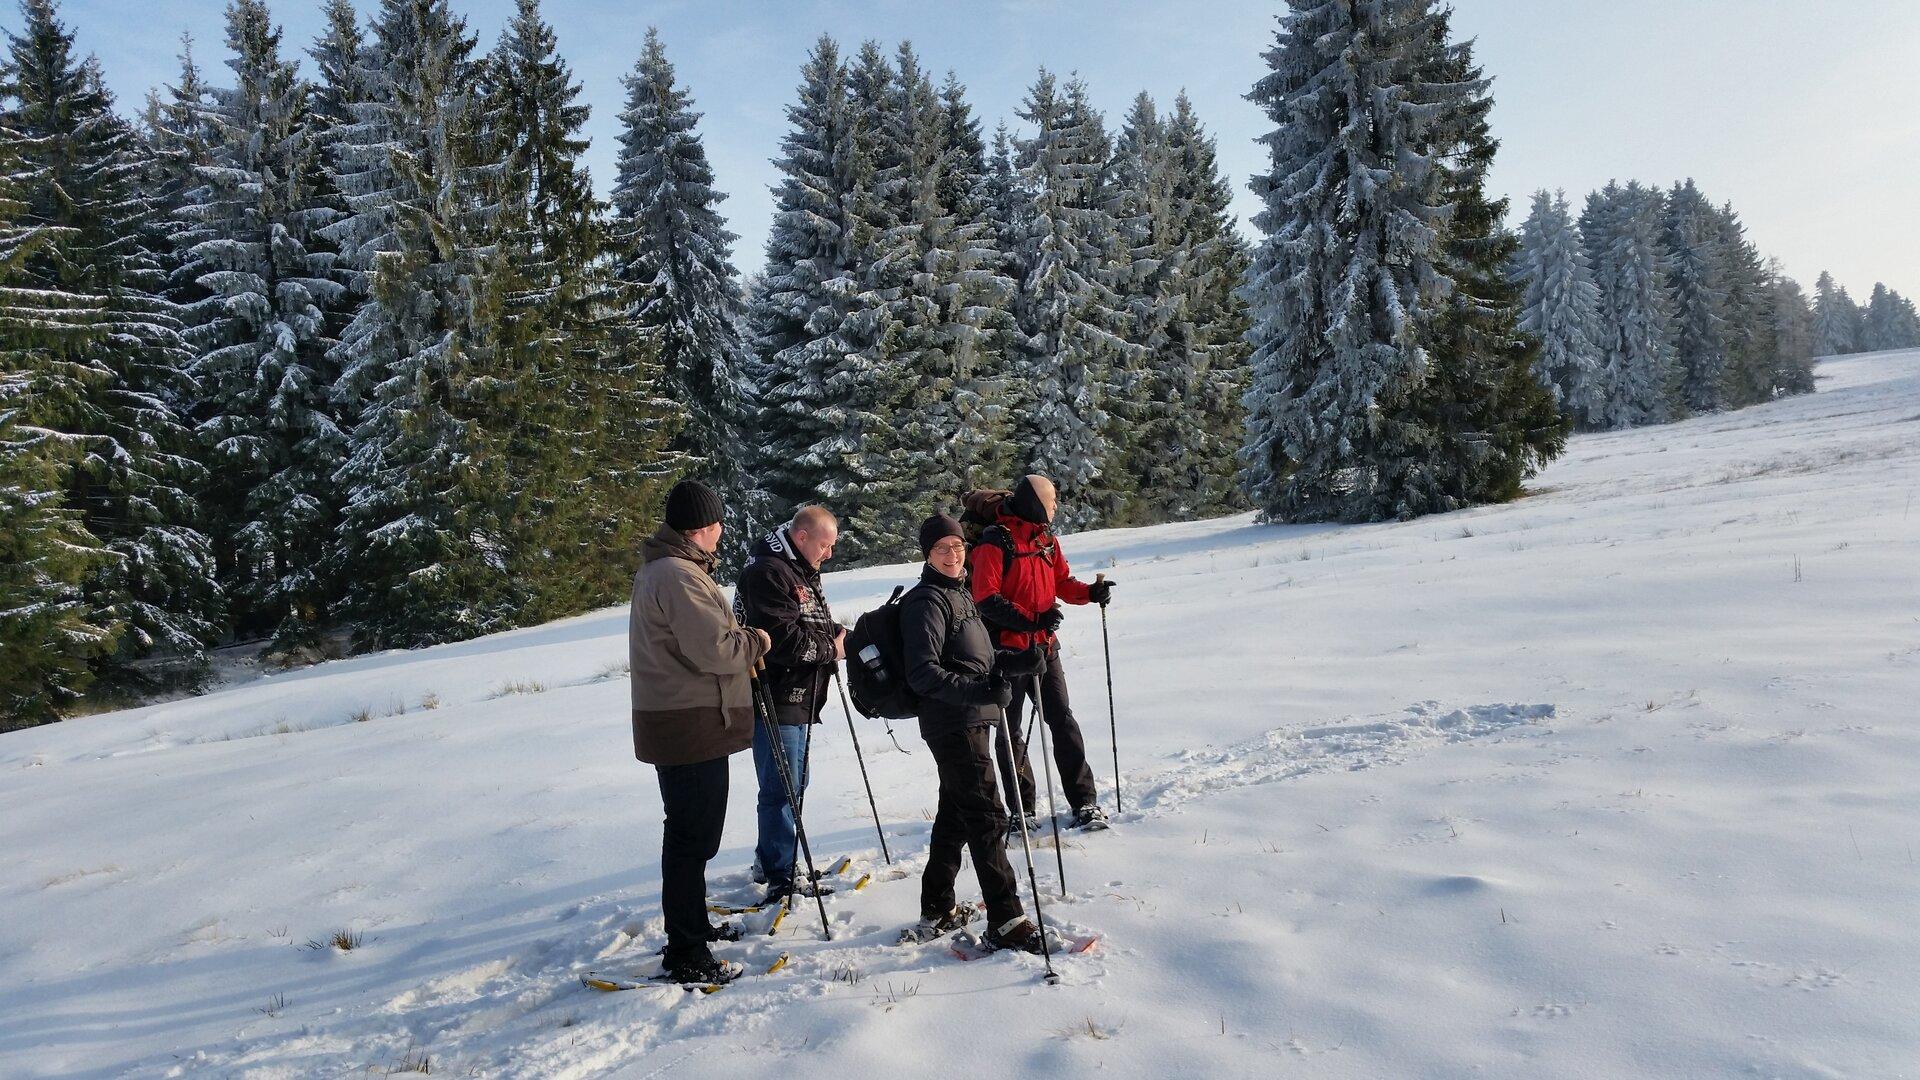 Schneeschuhtrapperwanderung_Foto_Heike_Bluhm